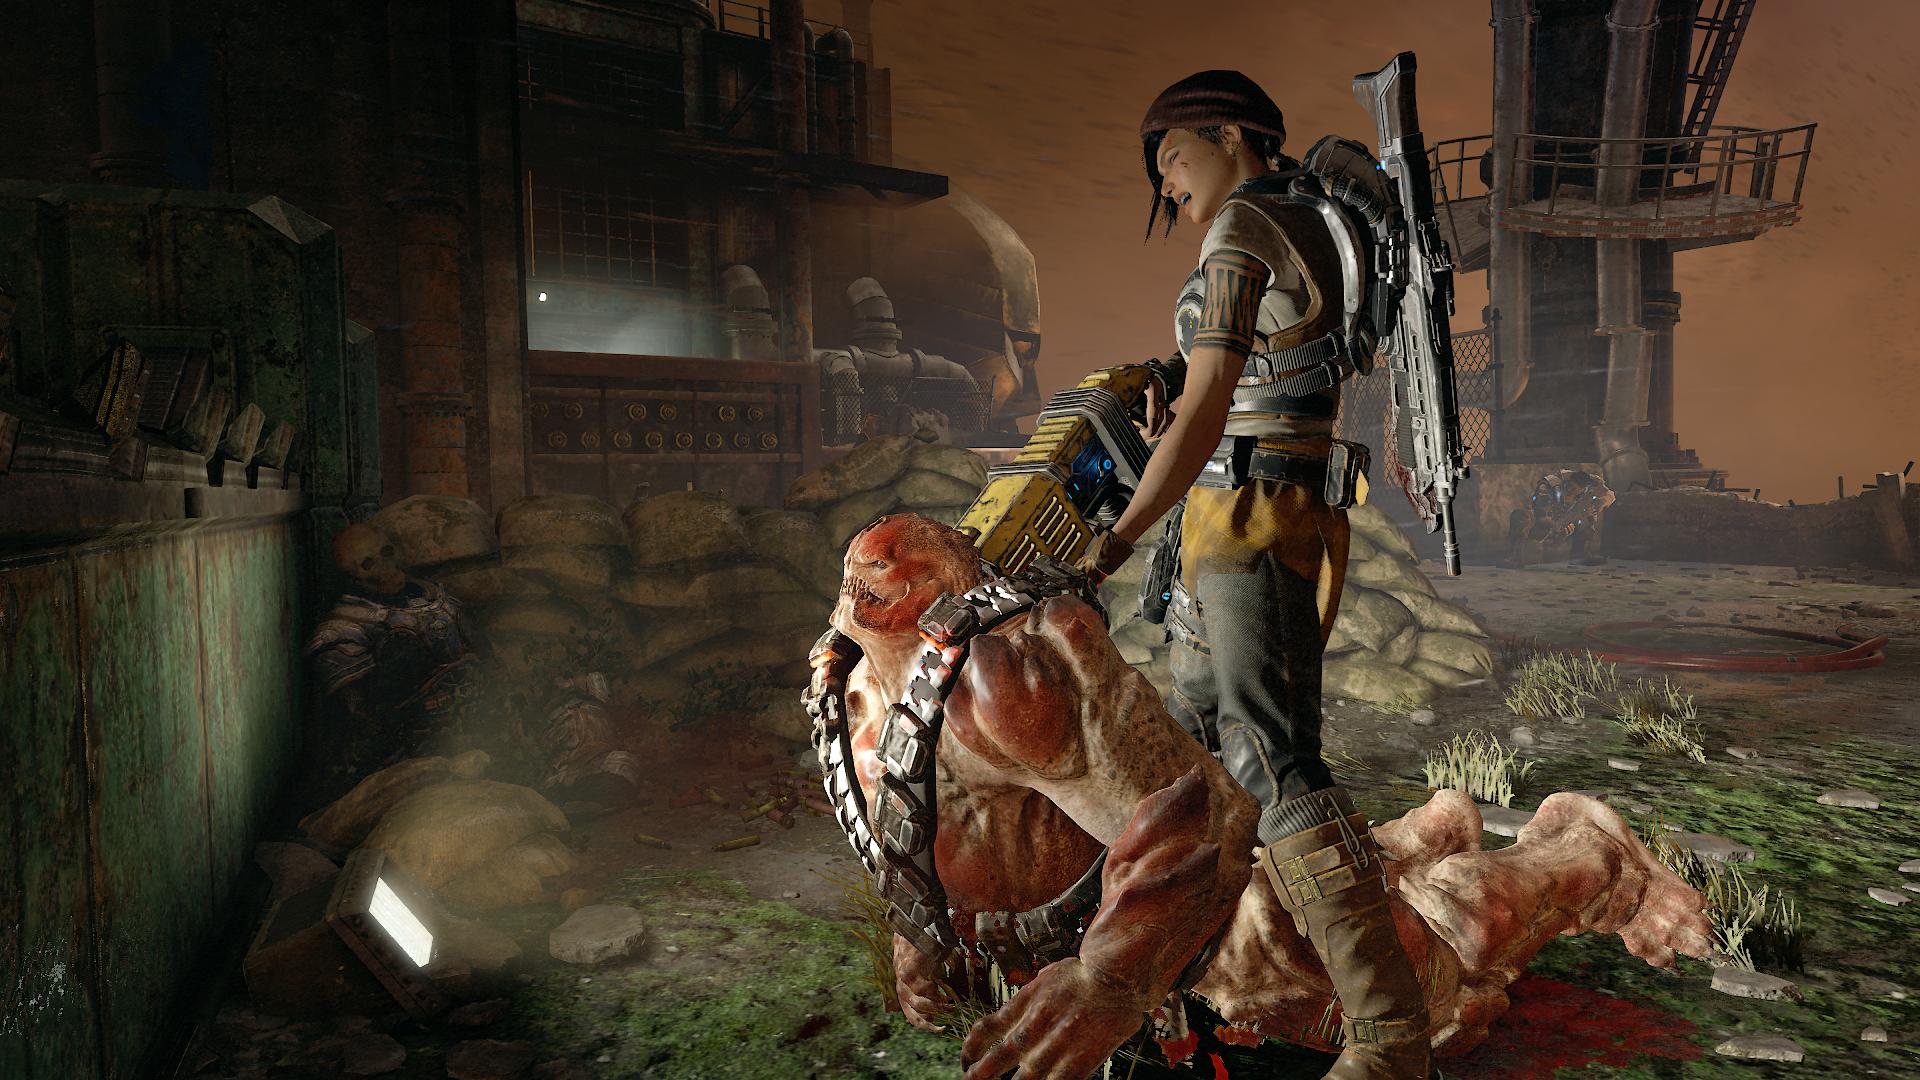 Gears of War 4 lanseres til Xbox One og Windows 10 i oktober.